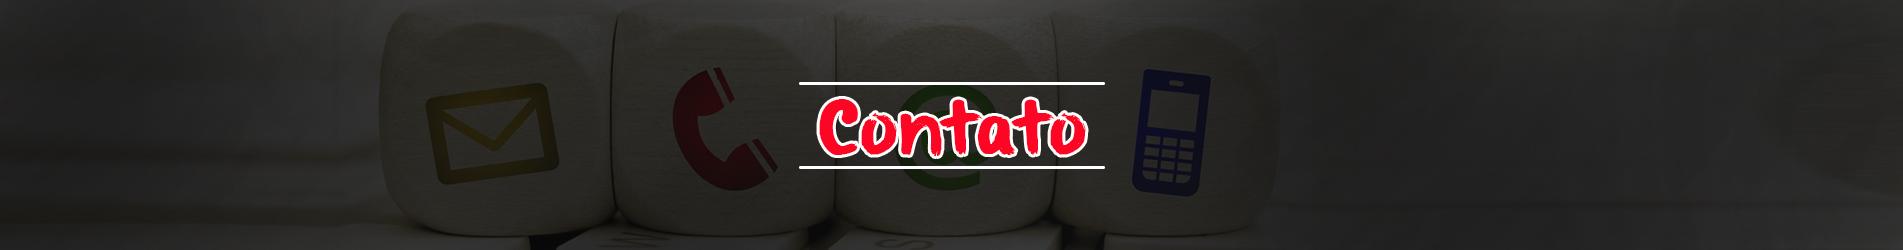 gestao-mix-banner-contato